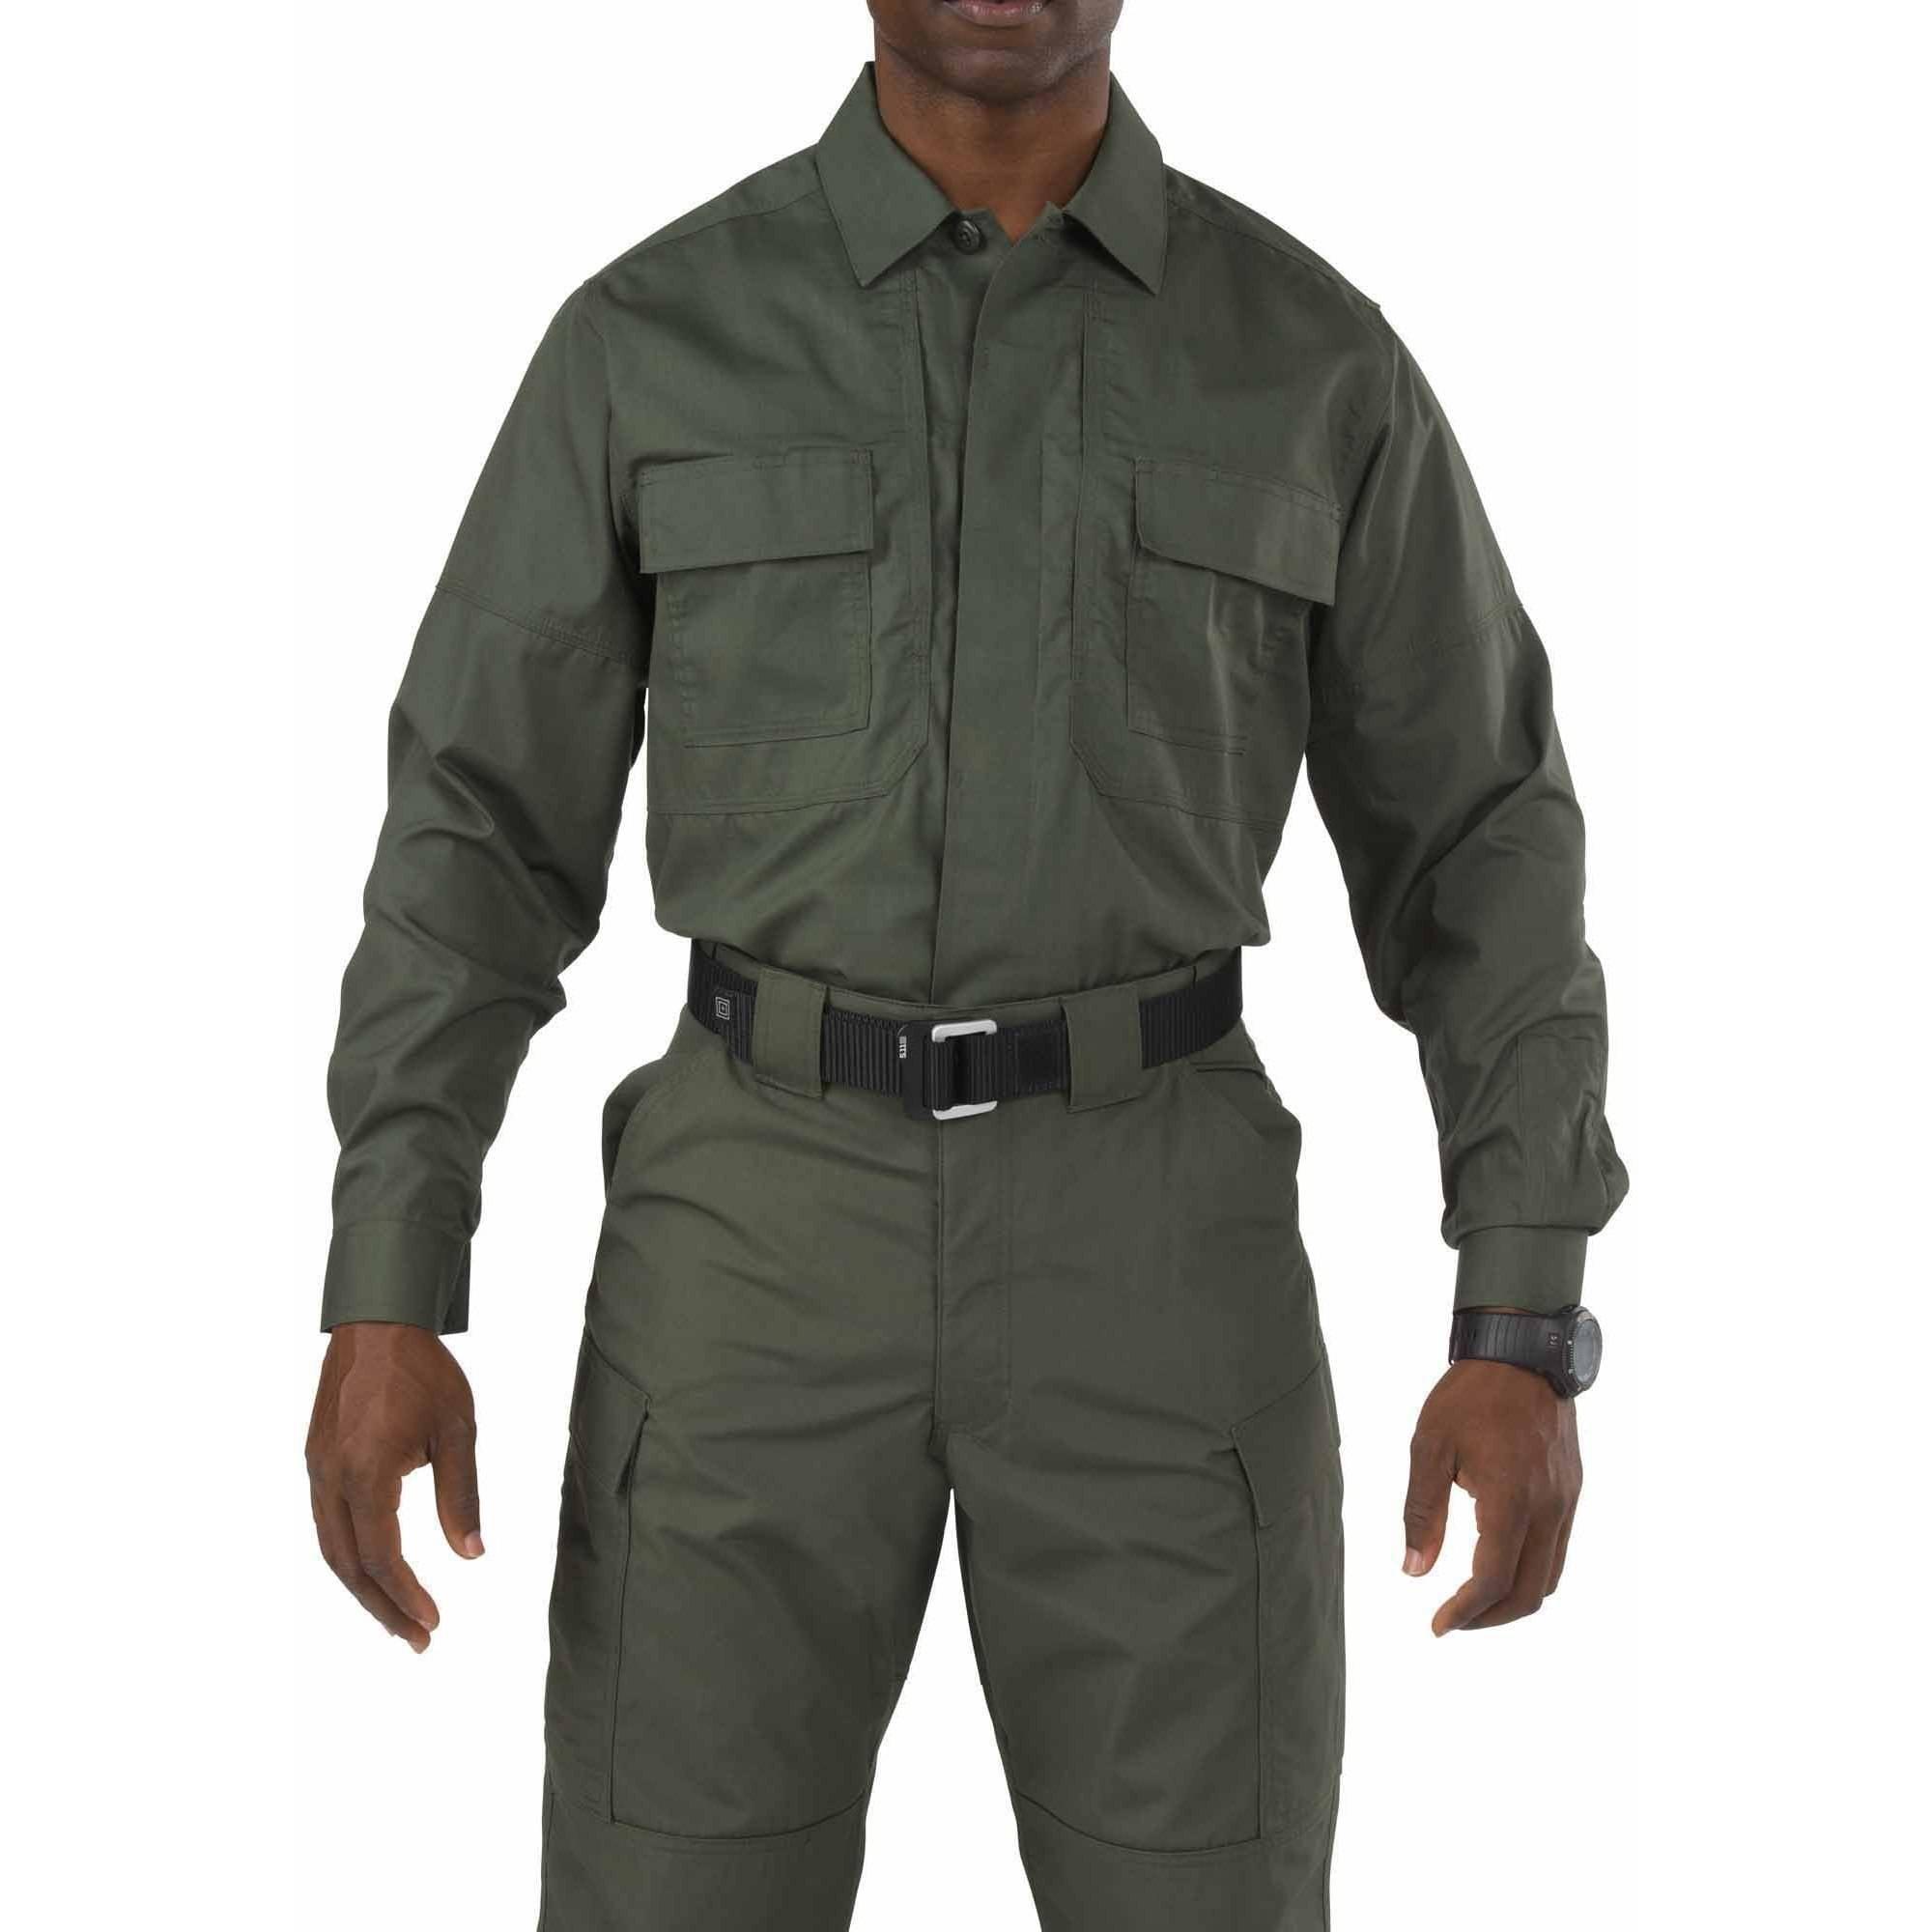 TacLite TDU Long Sleeve Shirt, TDU Green